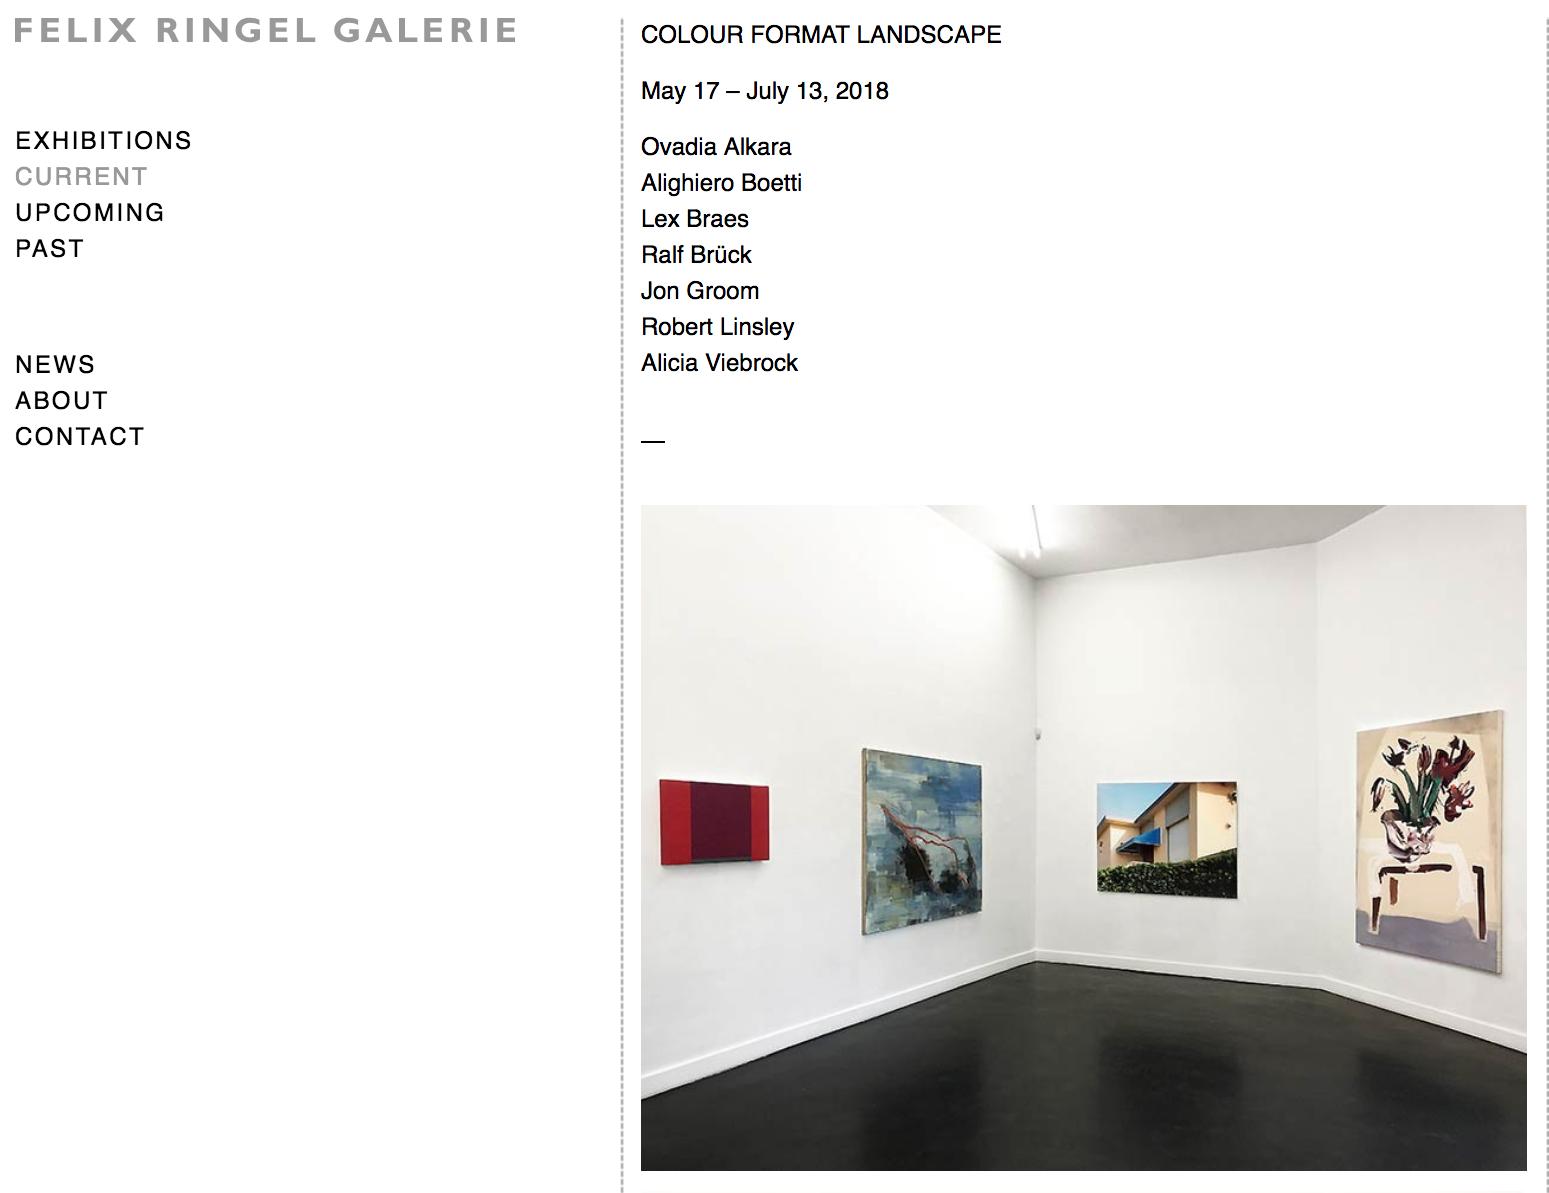 Ralf_Brueck_Felix_Ringel_Gallery.png